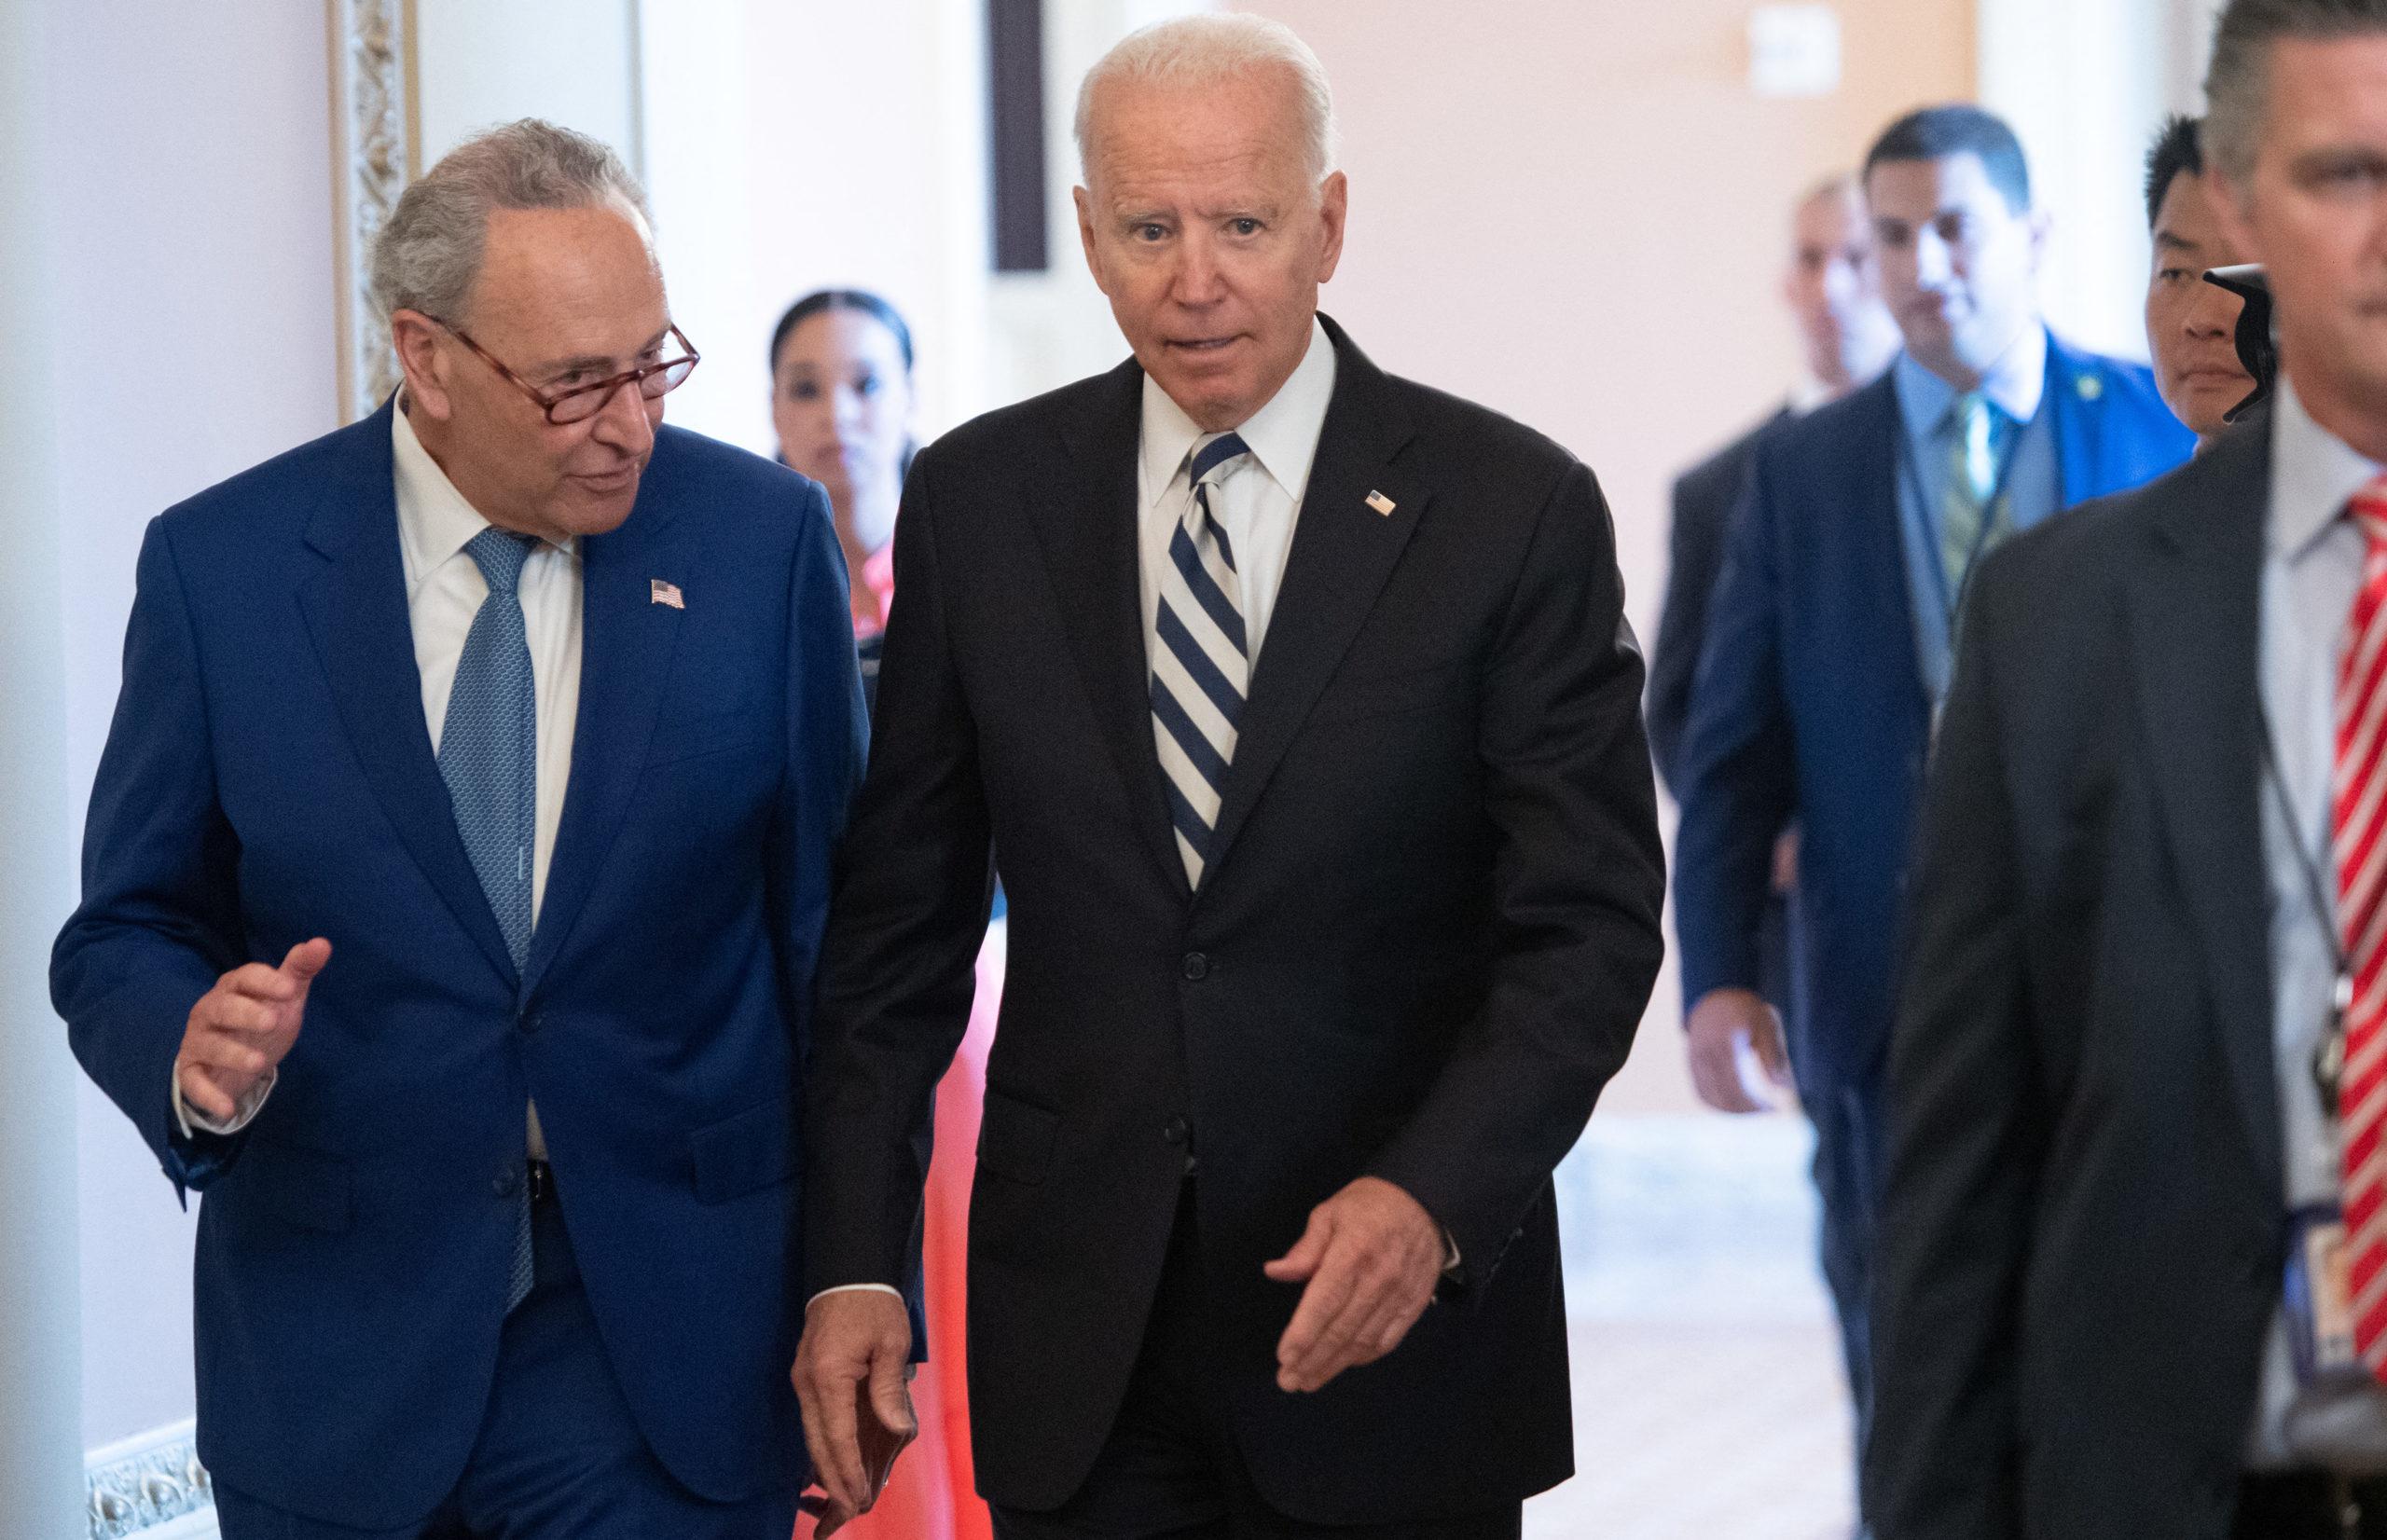 President Joe Biden speaks with Senate Majority Leader Chuck Schumer on July 13 at the Capitol. (Saul Loeb/AFP via Getty Images)